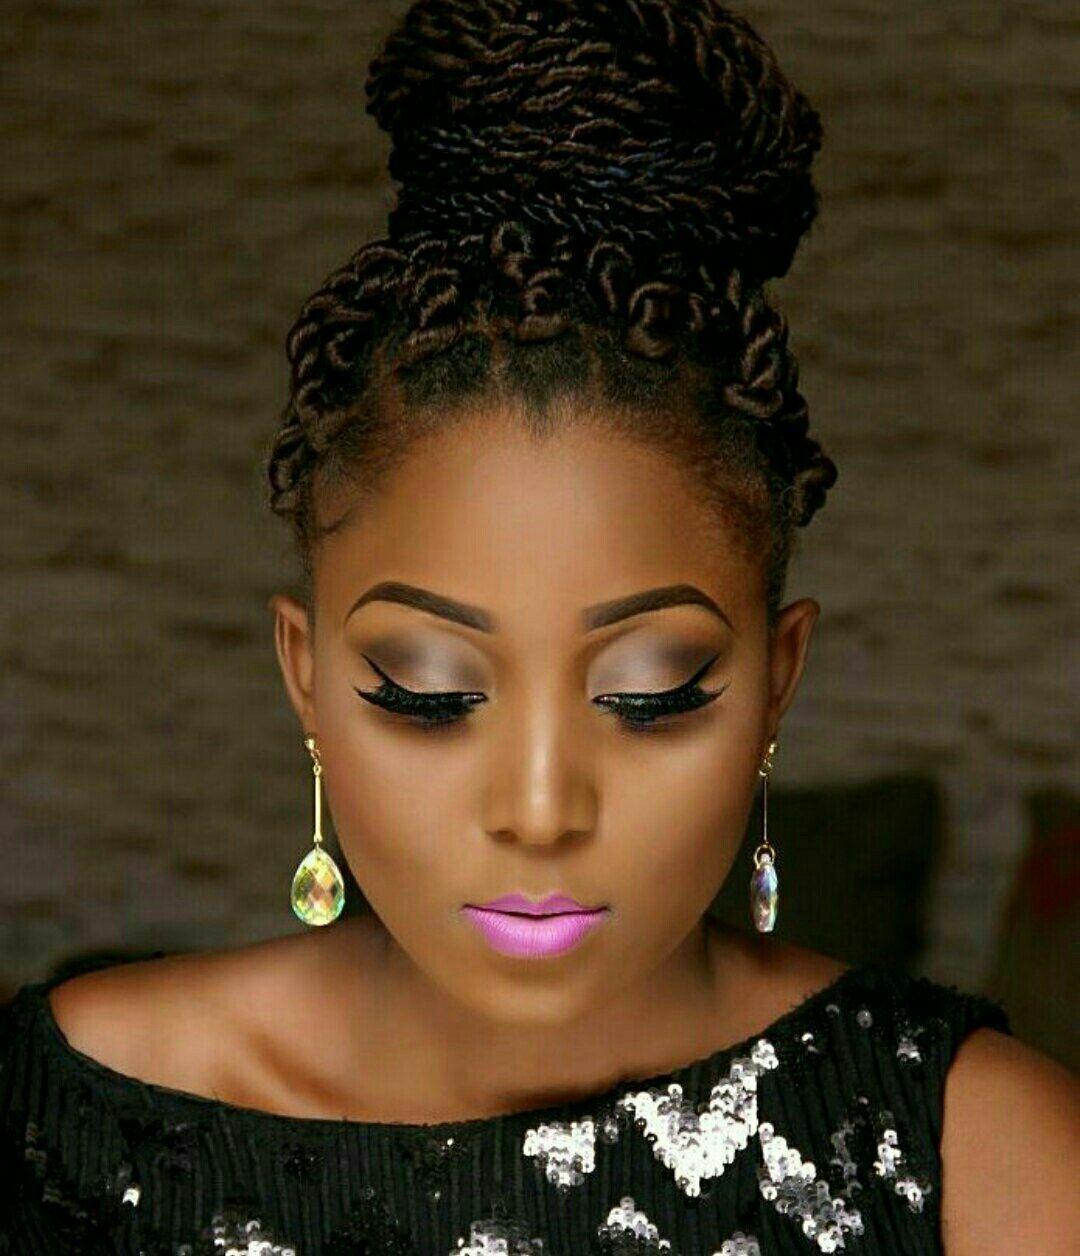 Pin by Teeka4 on Nigerian Makeup Artists Black natural